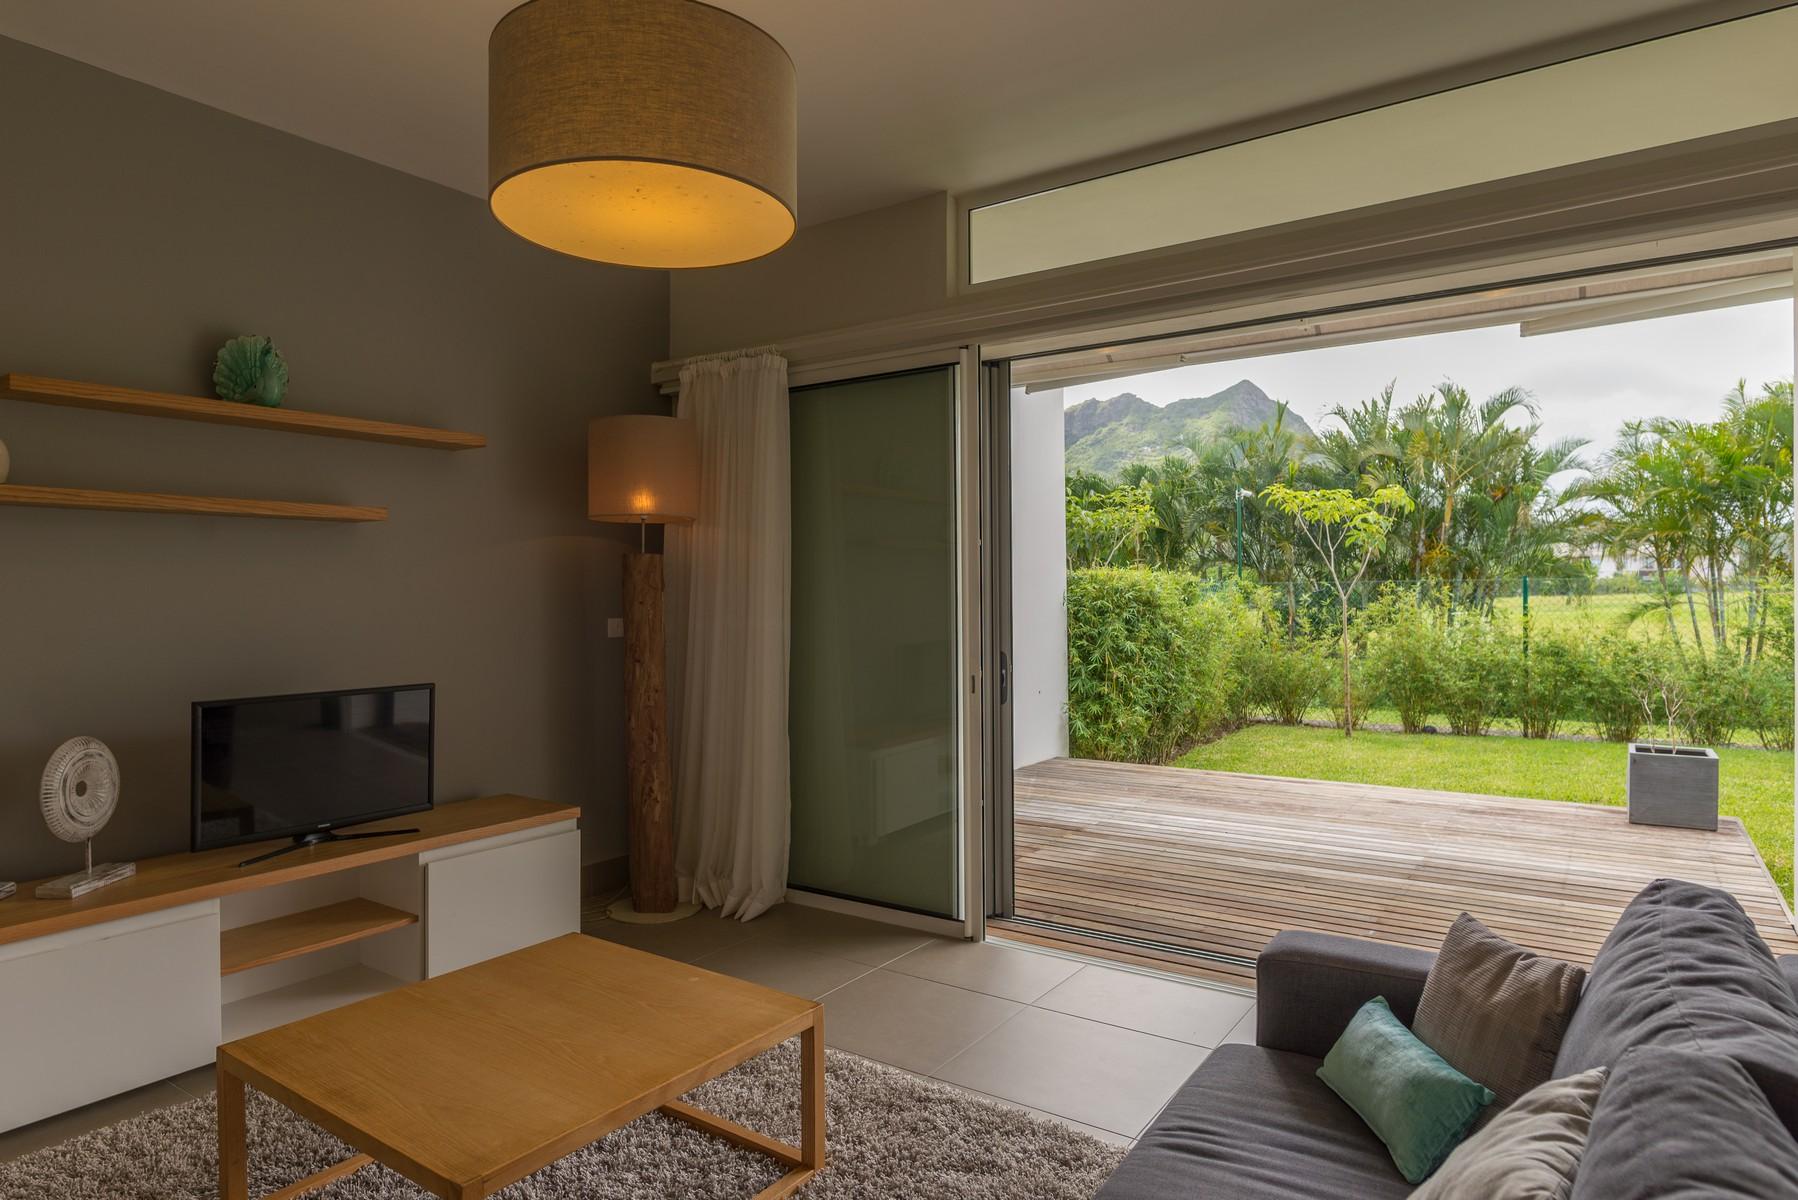 Duplex for Sale at Duplex at Les Allees d'Helvetia Helvetia, Moka 8083 Mauritius